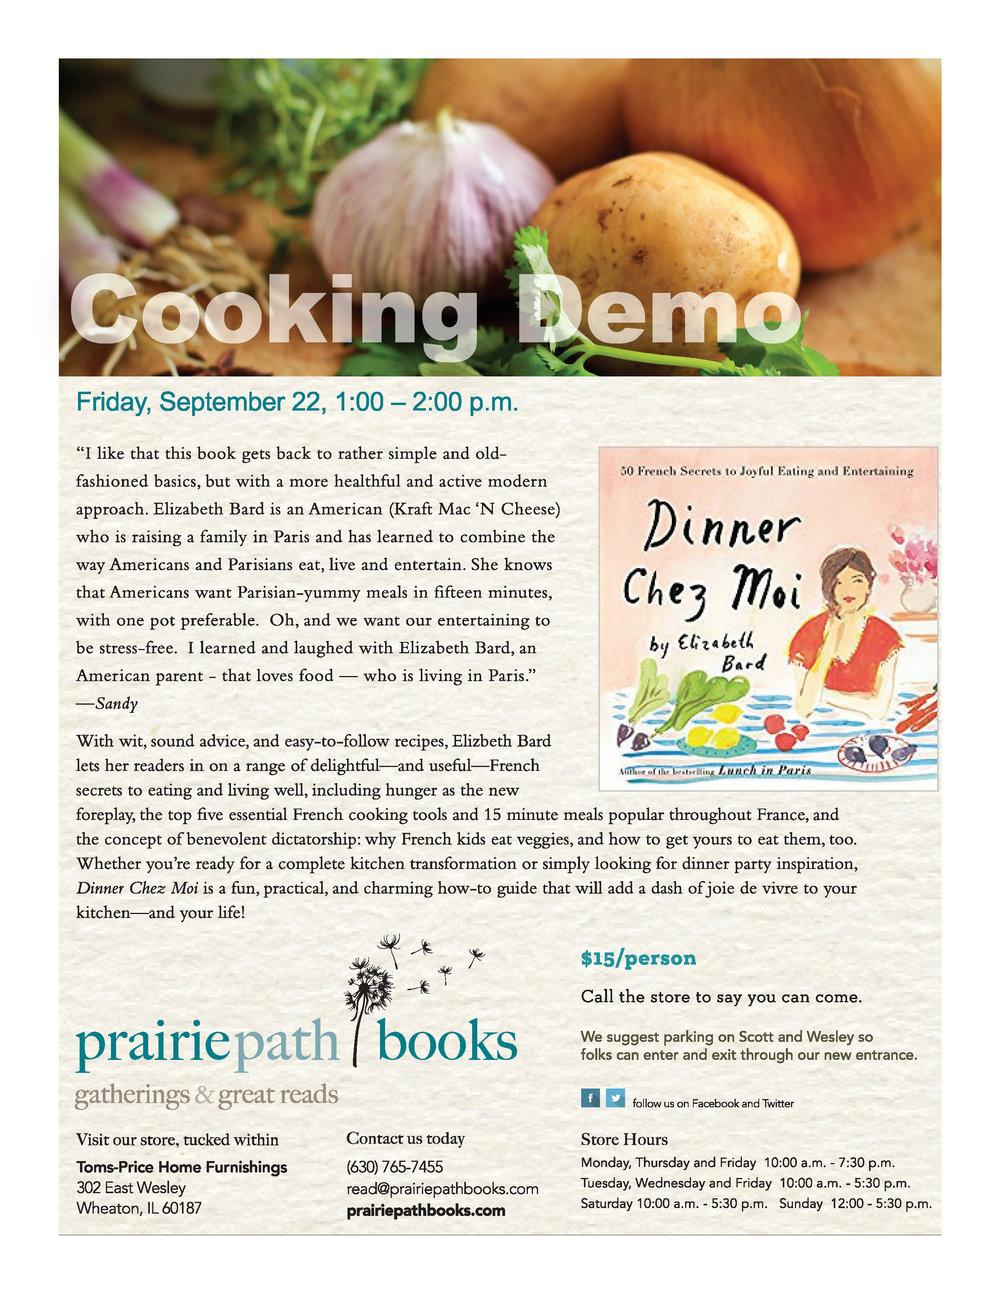 CookingDemo_DinnerChezMoi.jpg